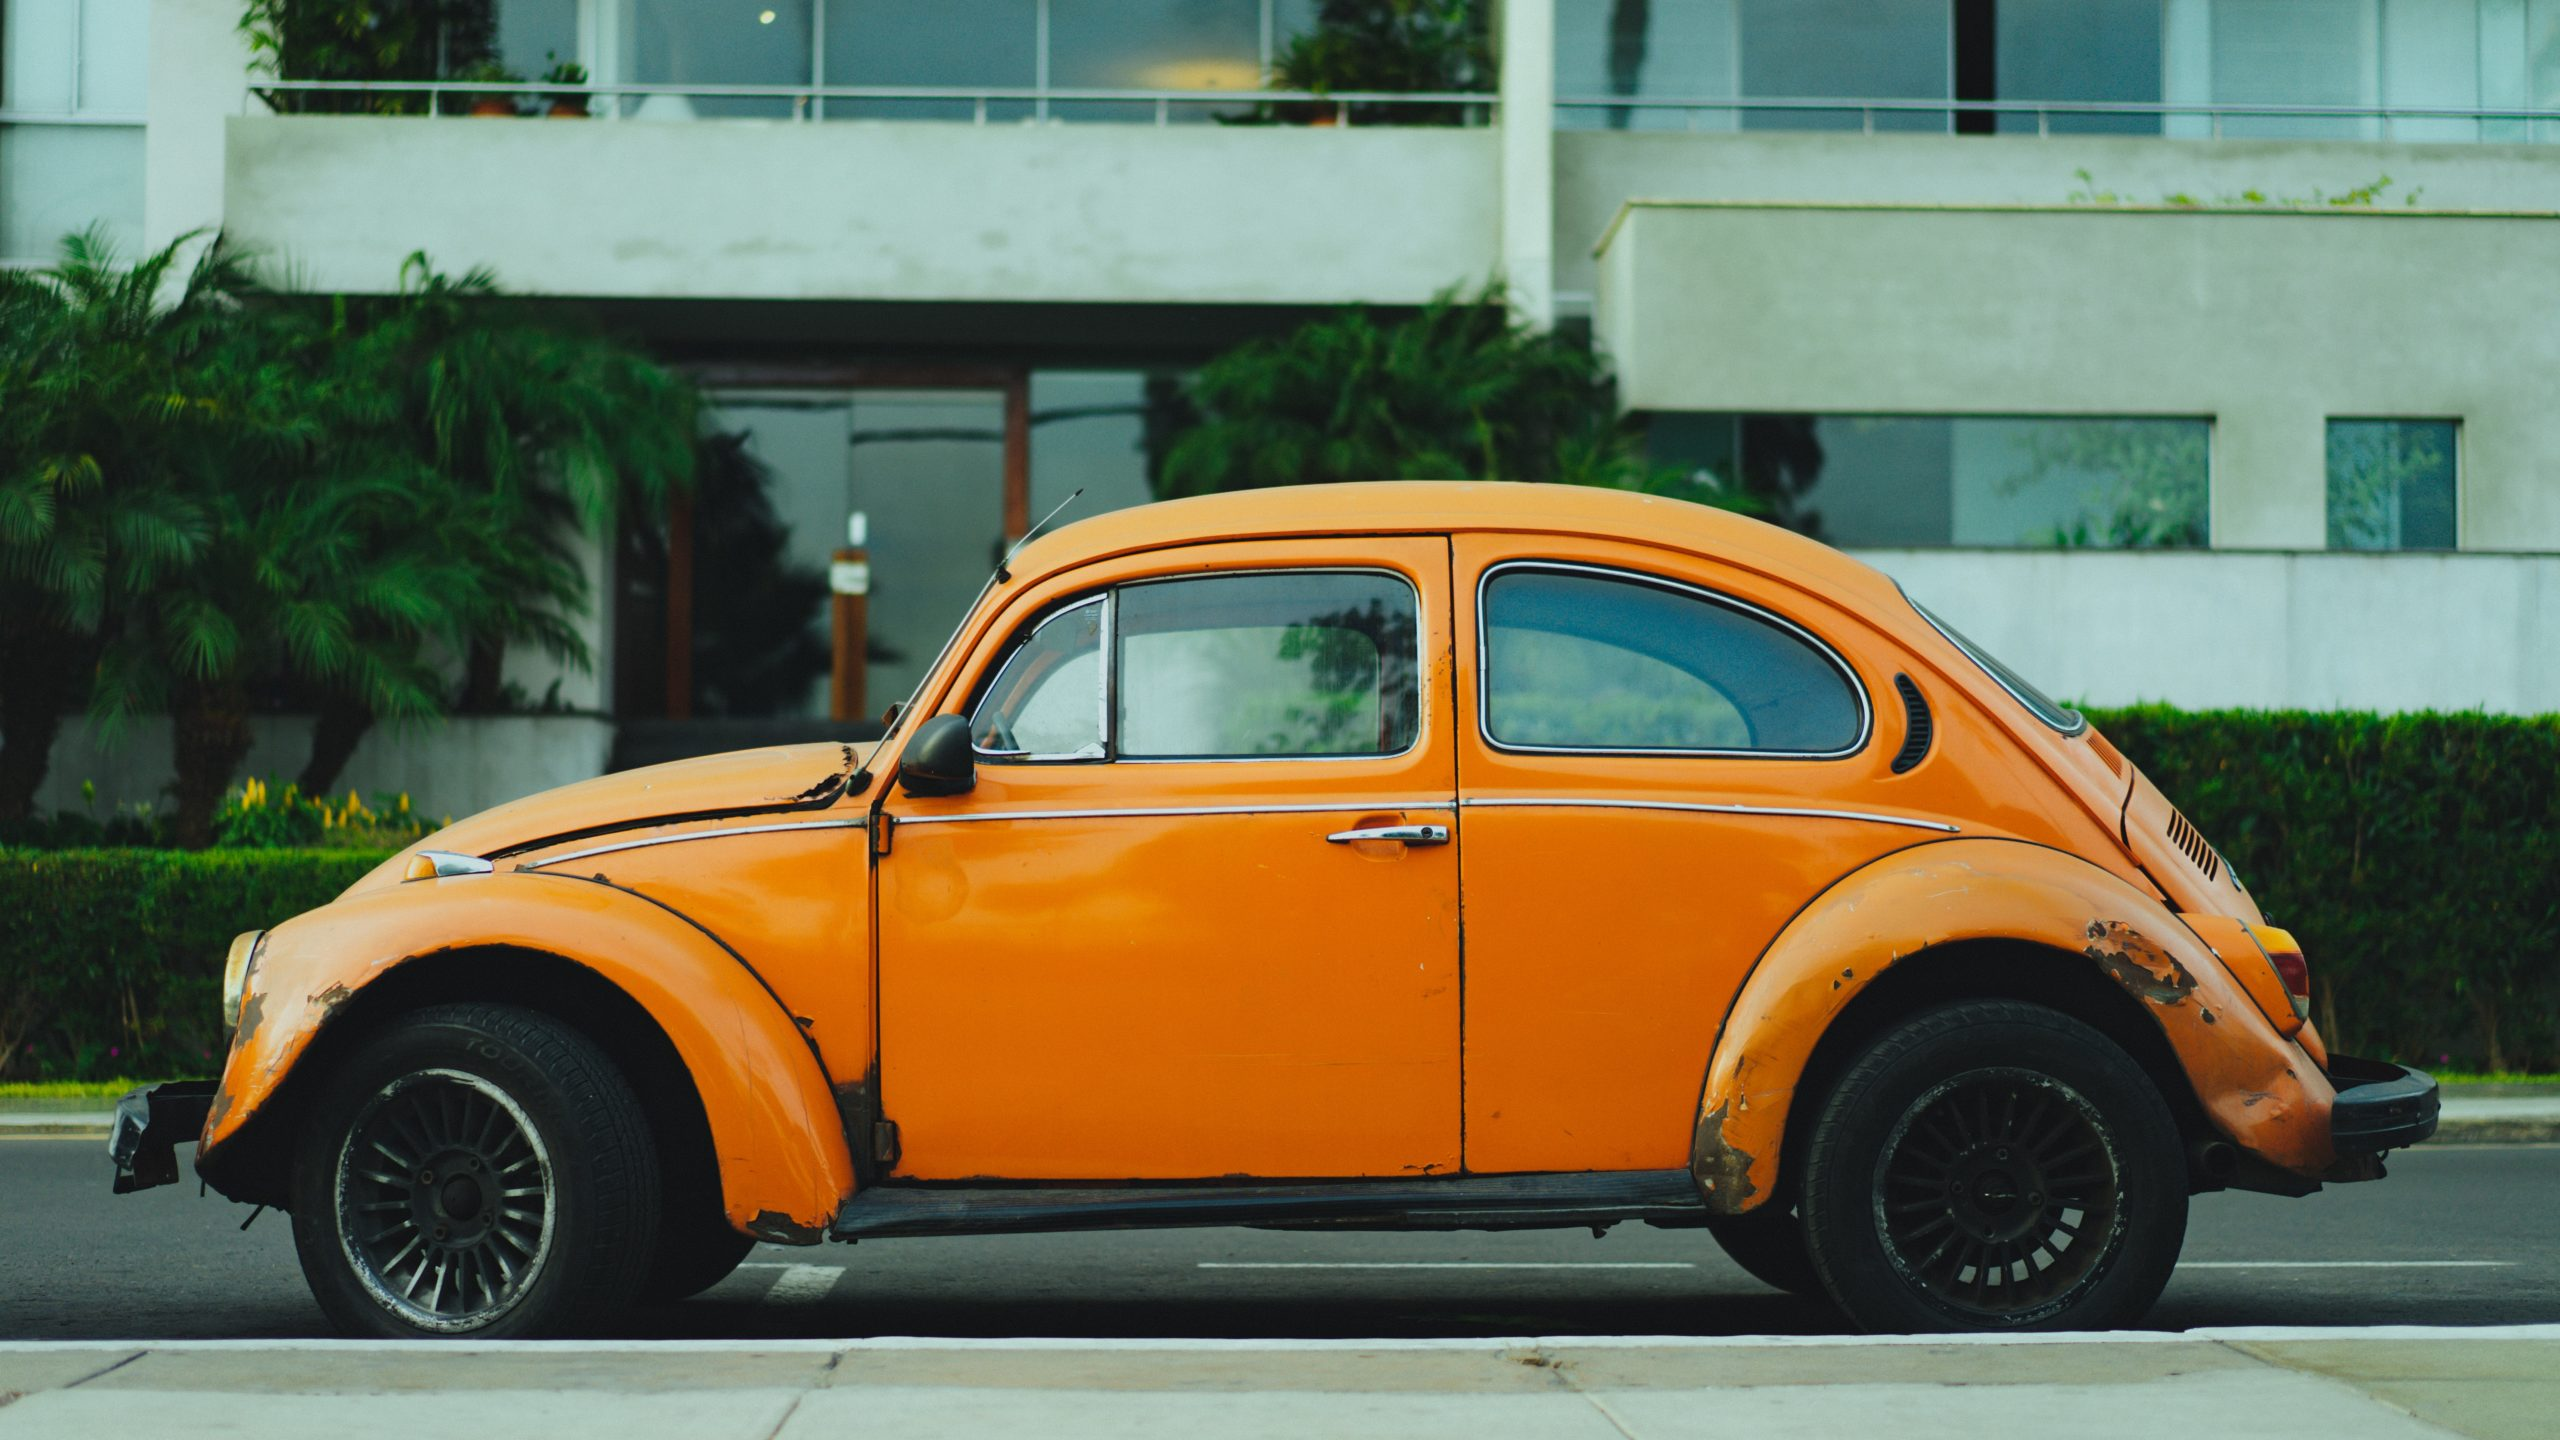 anwalt-recht-verkehrsrecht-auto-kauf-scaled